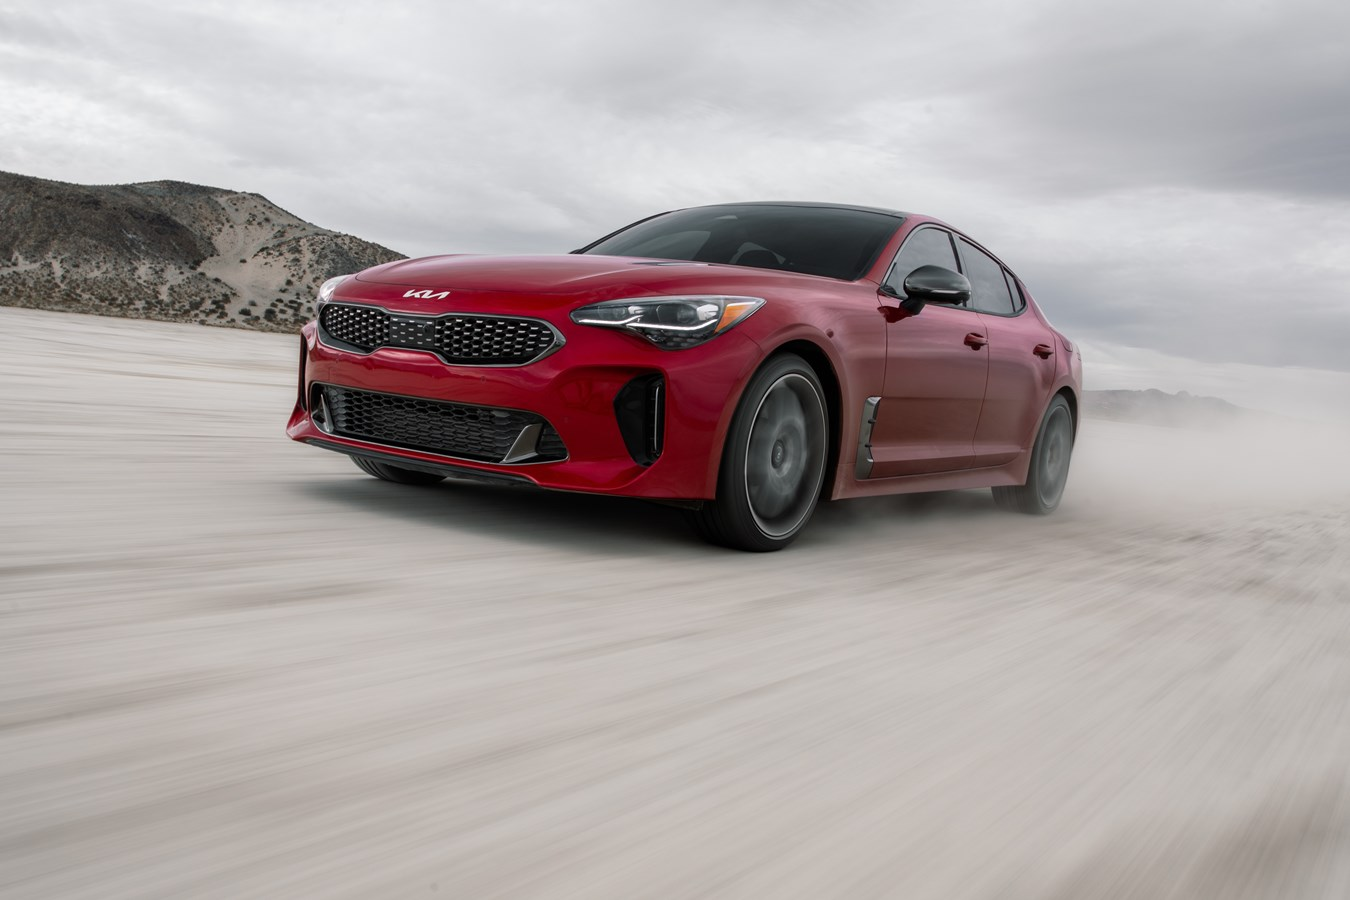 2022 Stinger GT front three-quarter dynamic flats action